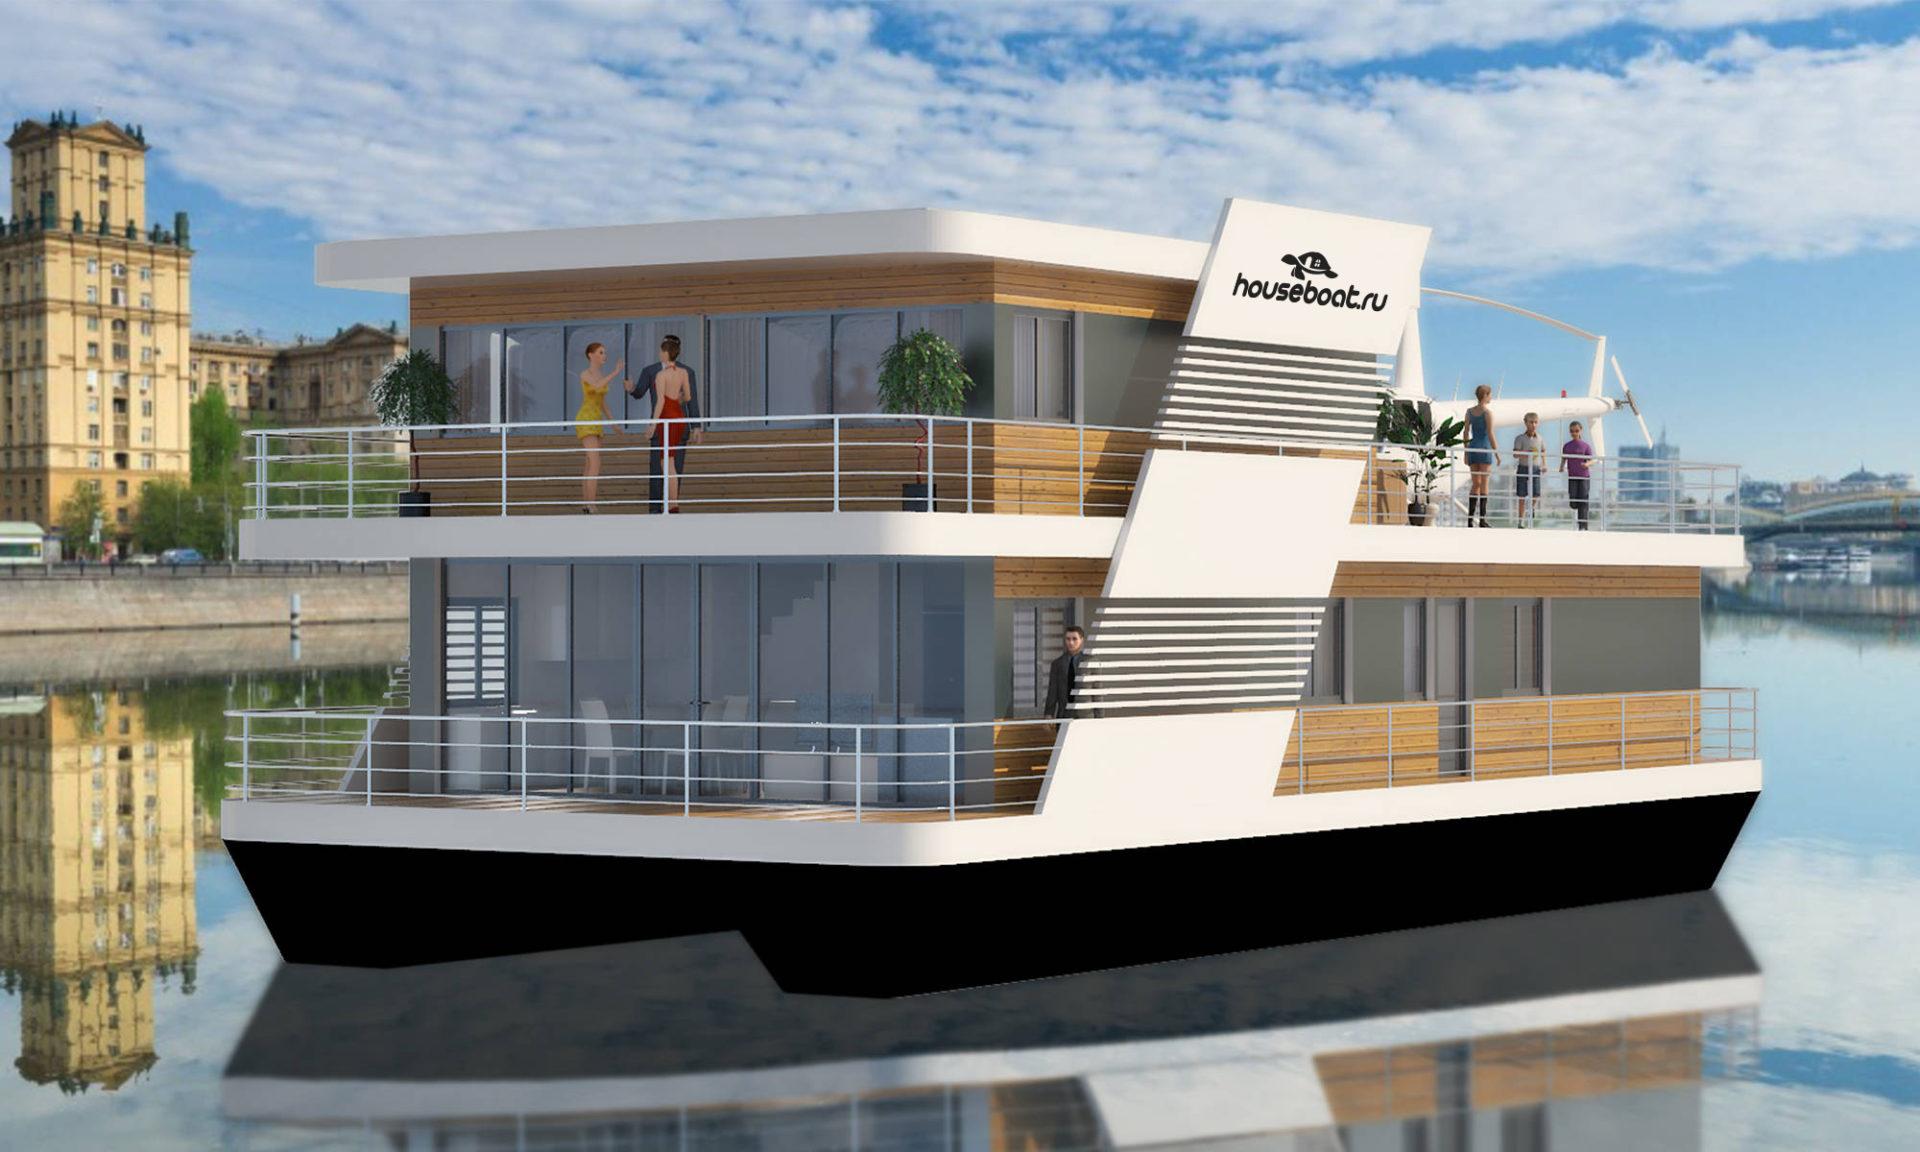 http://houseboat.ru/wp-content/uploads/2016/09/8-1-1.jpg